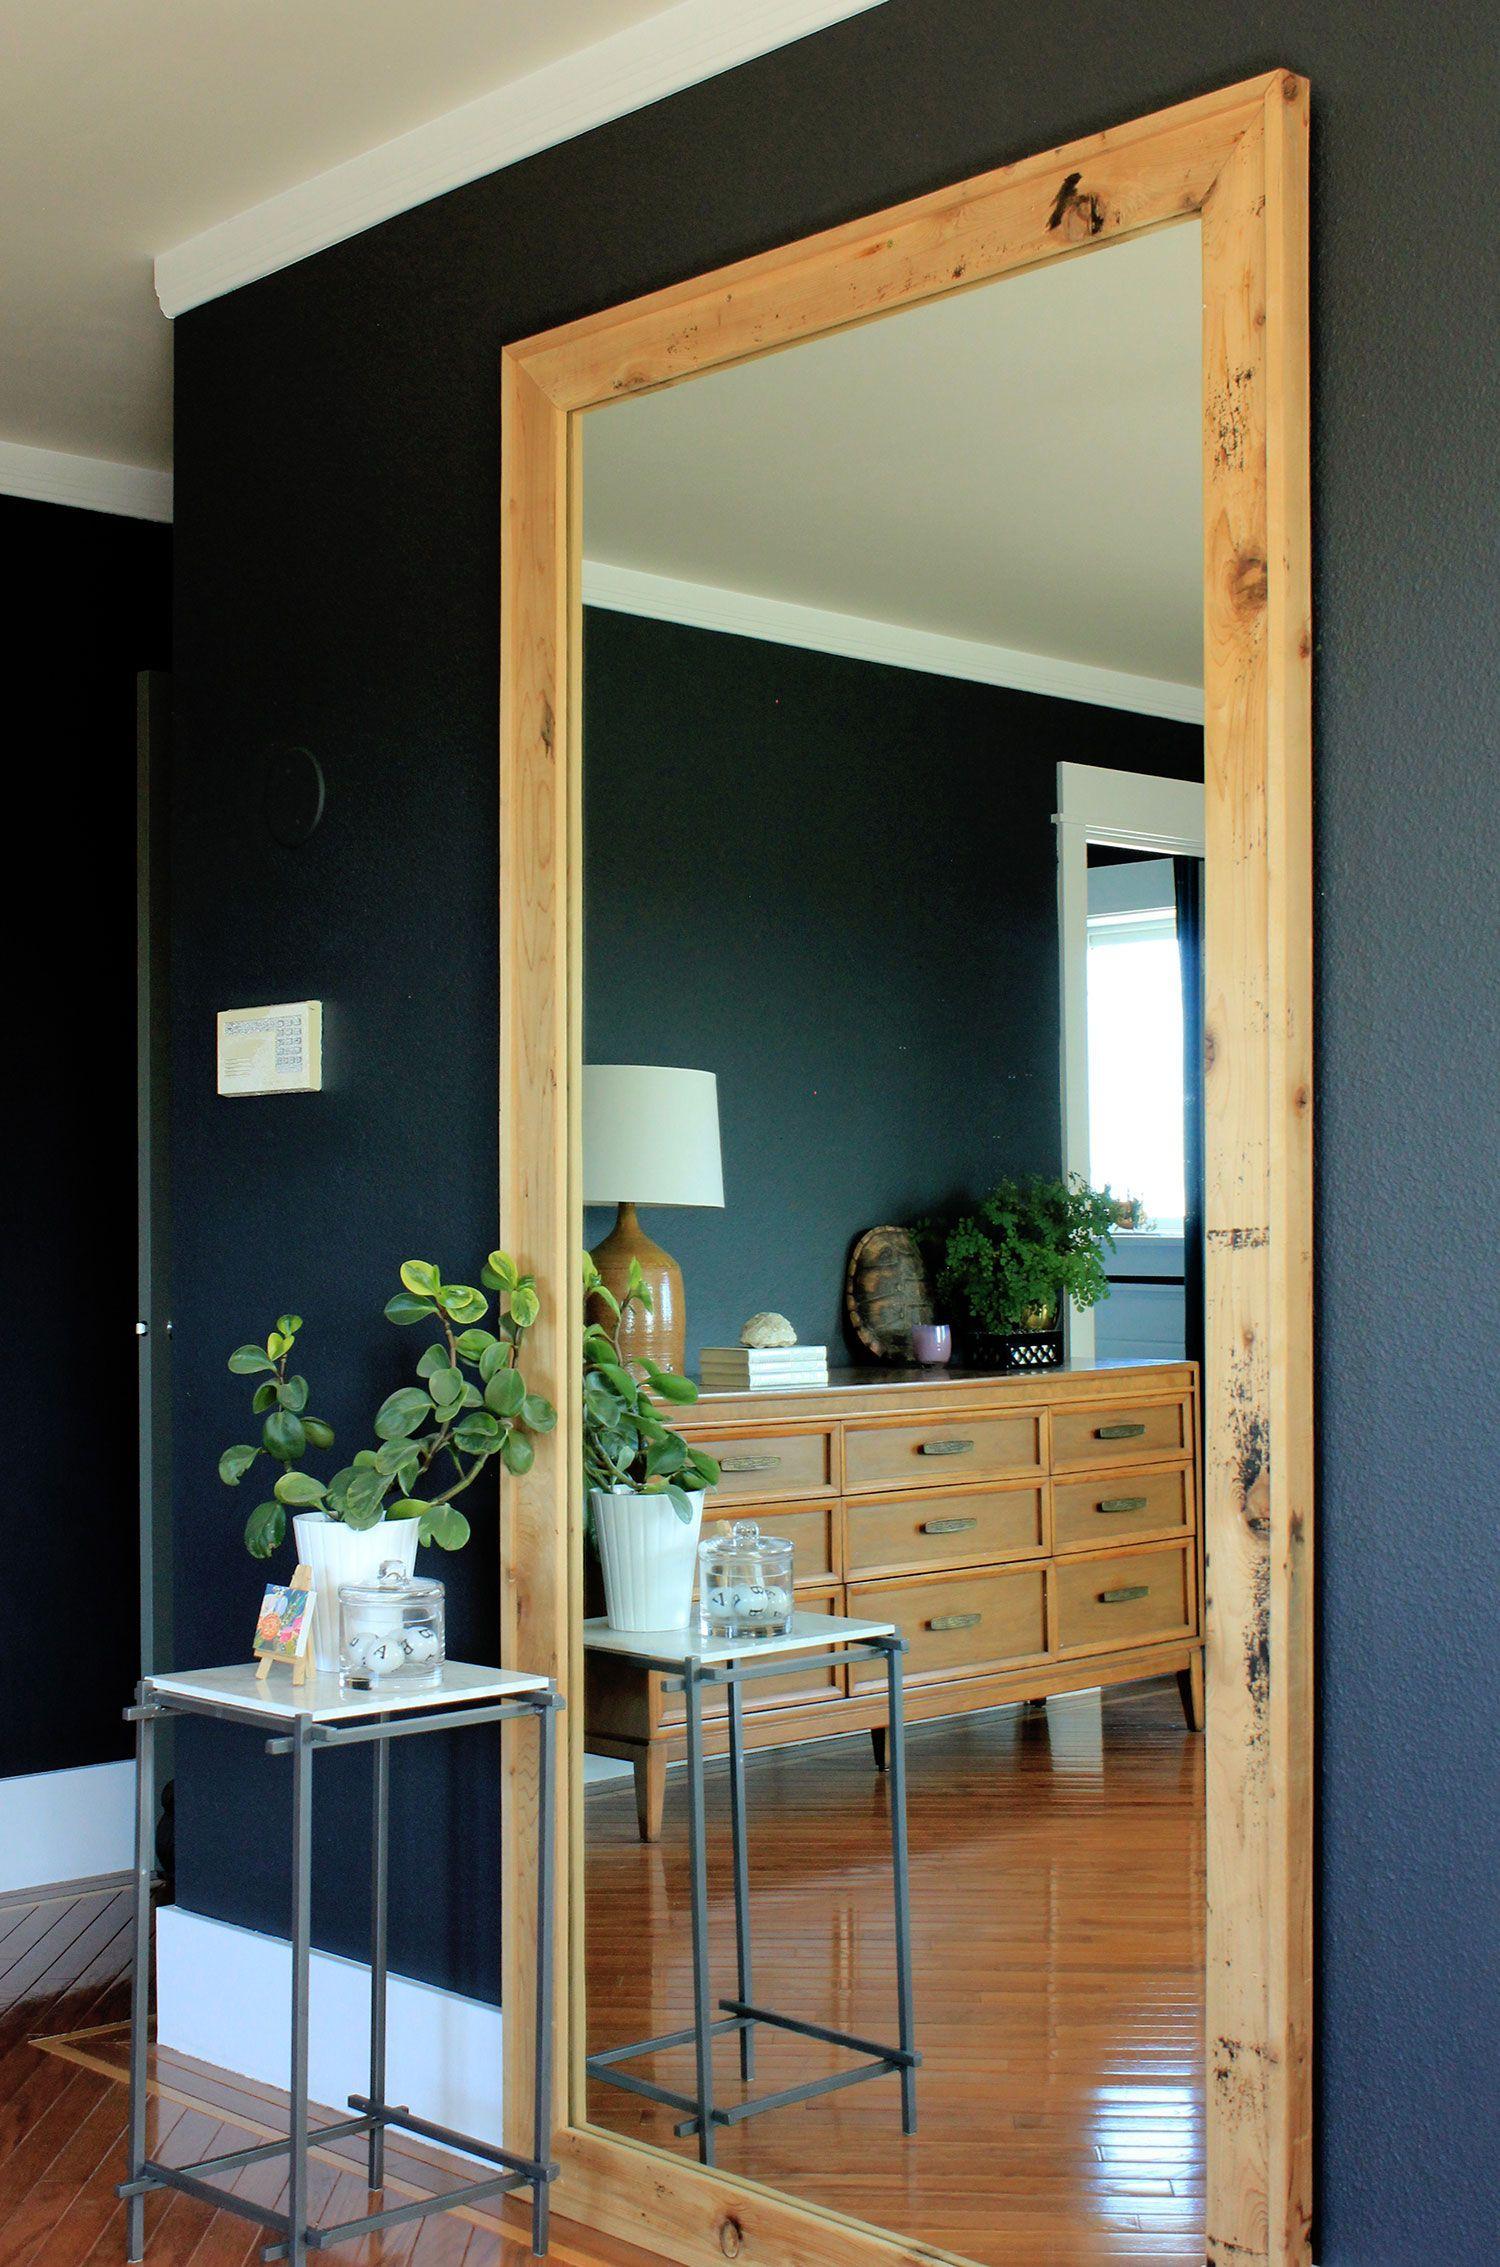 15+ Stupefying Wall Mirror Horizontal Ideas in 2020